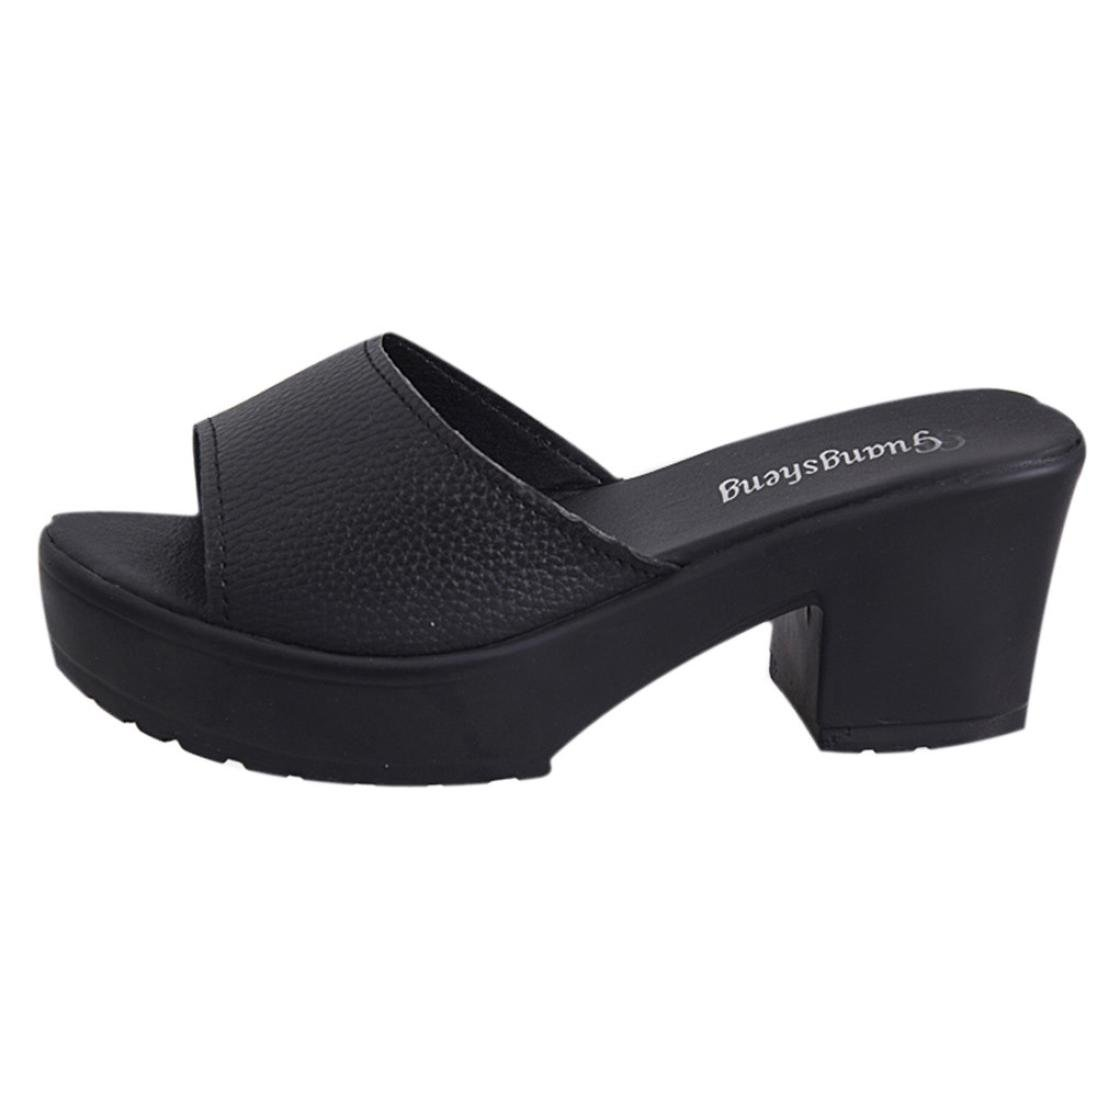 YANG-YI Clearance Women High Heeled Platform Soft Wedges Flip Flop Sandals (Black, US-8)